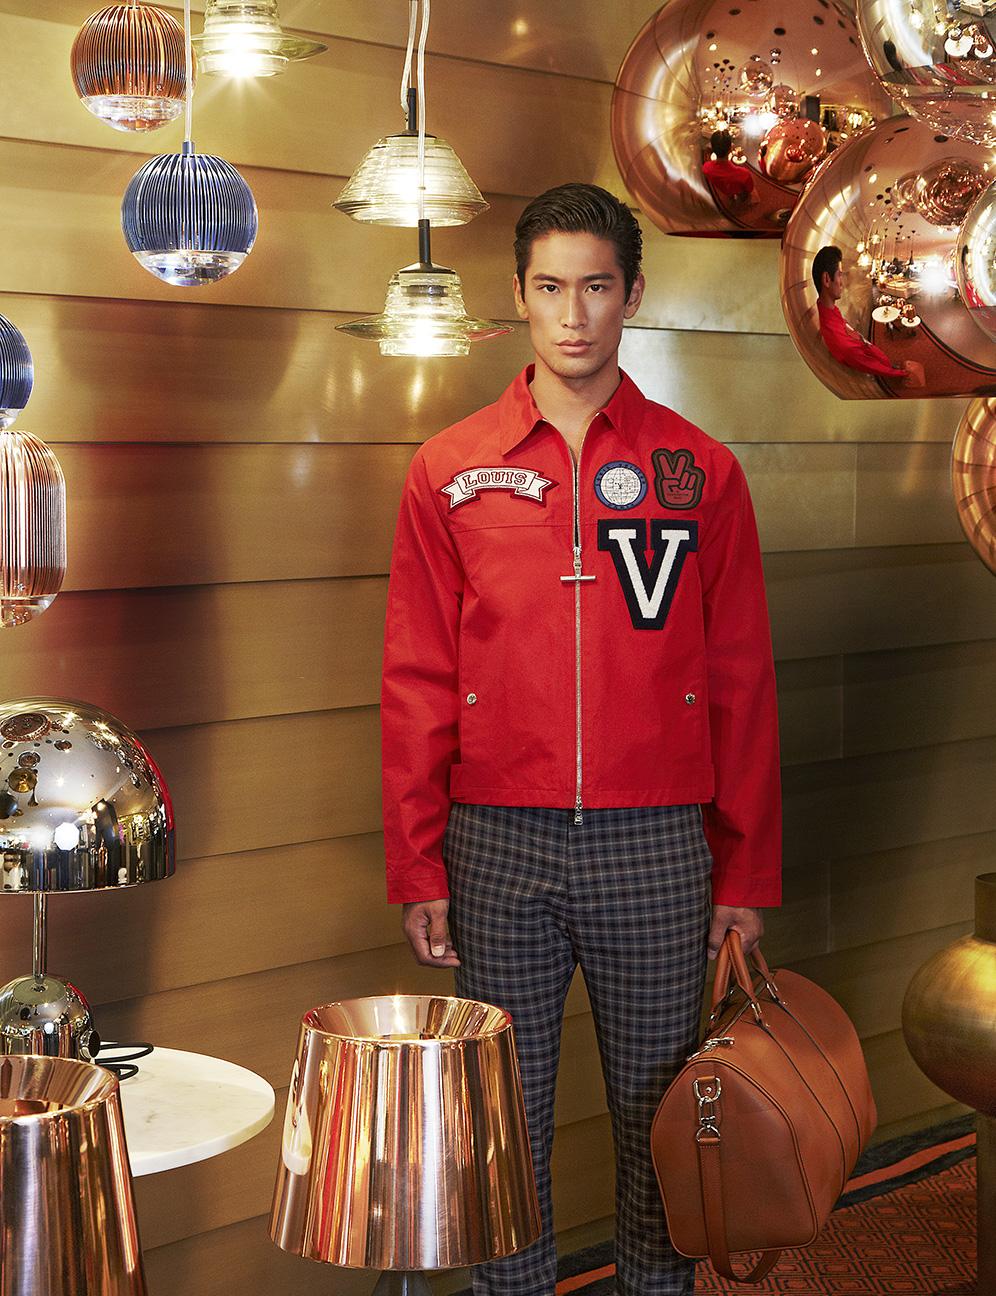 Model :Takuya Nakamura @model_taku Clothes and Bag : Louis Vuitton  Lightings : Tom Dixon at MOTIF 3rd Fl. Erawan Bangkok Tel 0-2250-7740